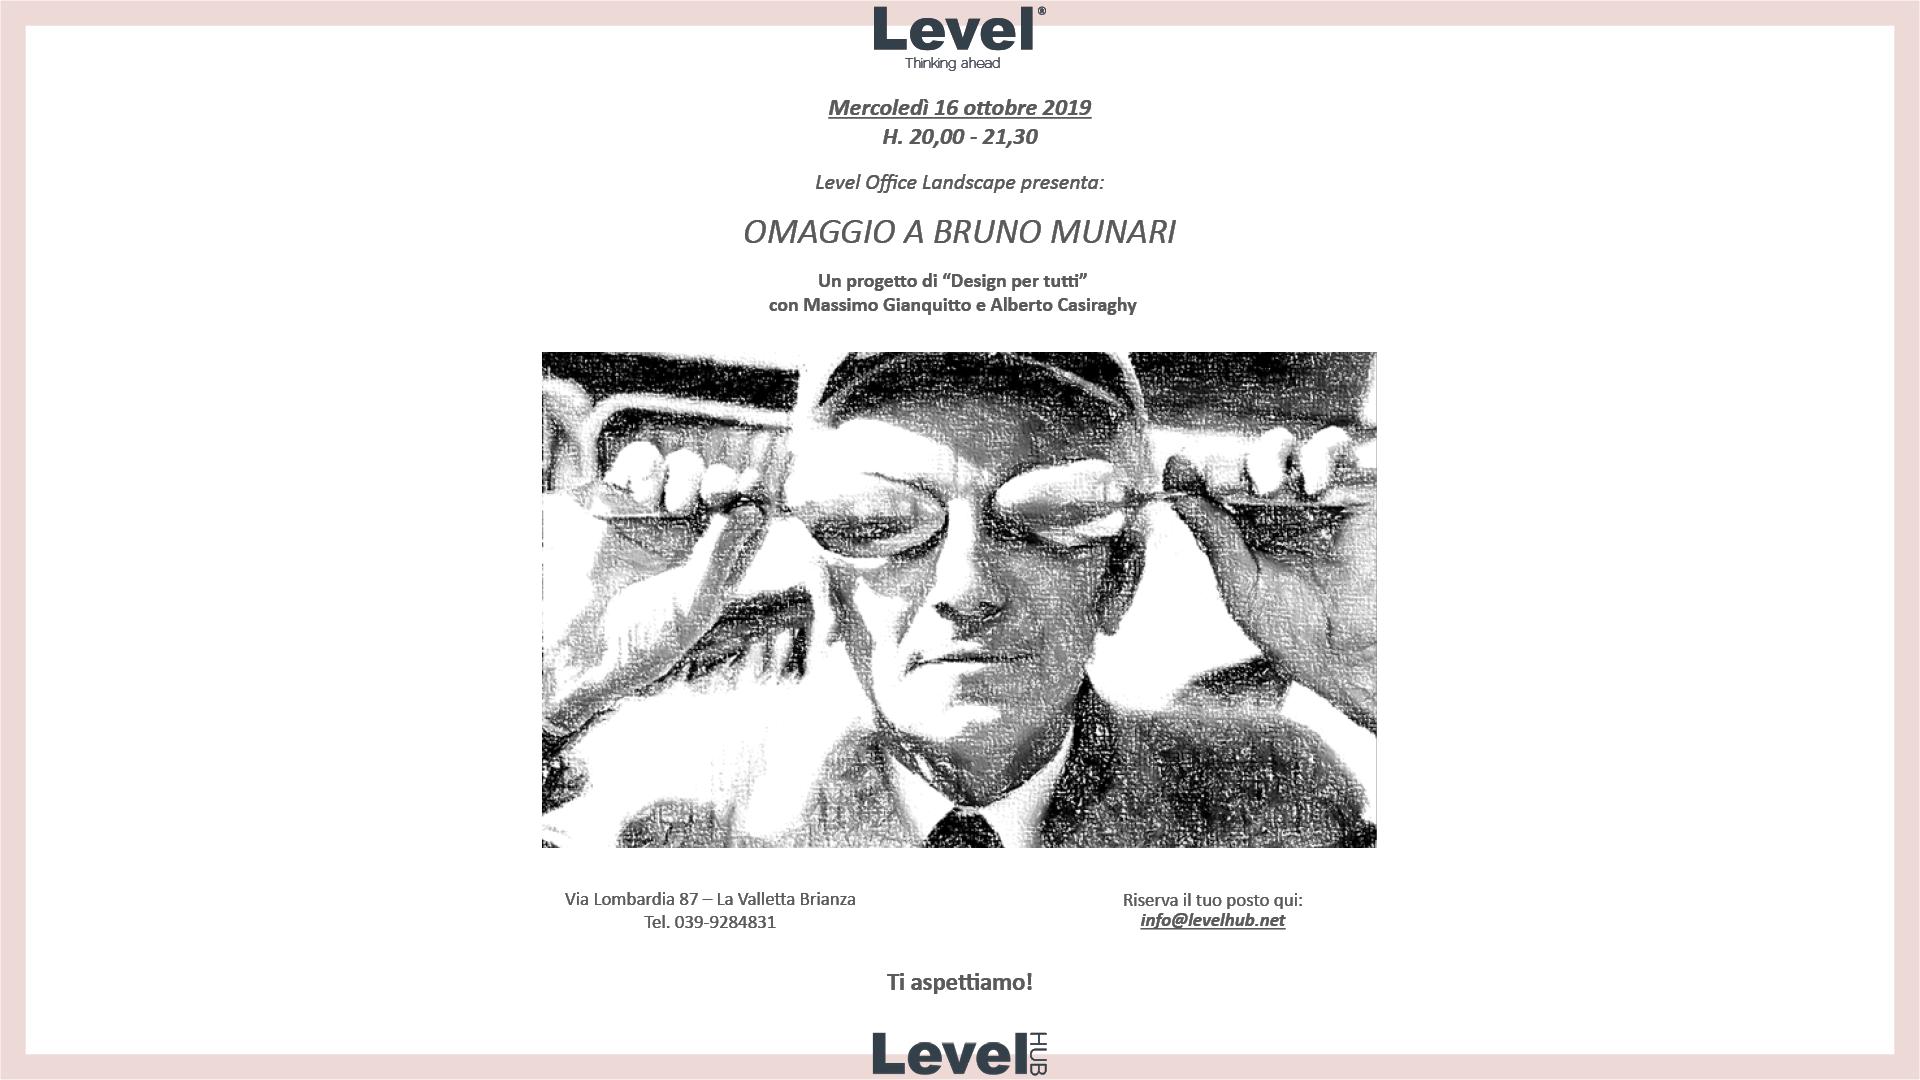 Omaggio-a-Bruno-Munari-LevelHUB